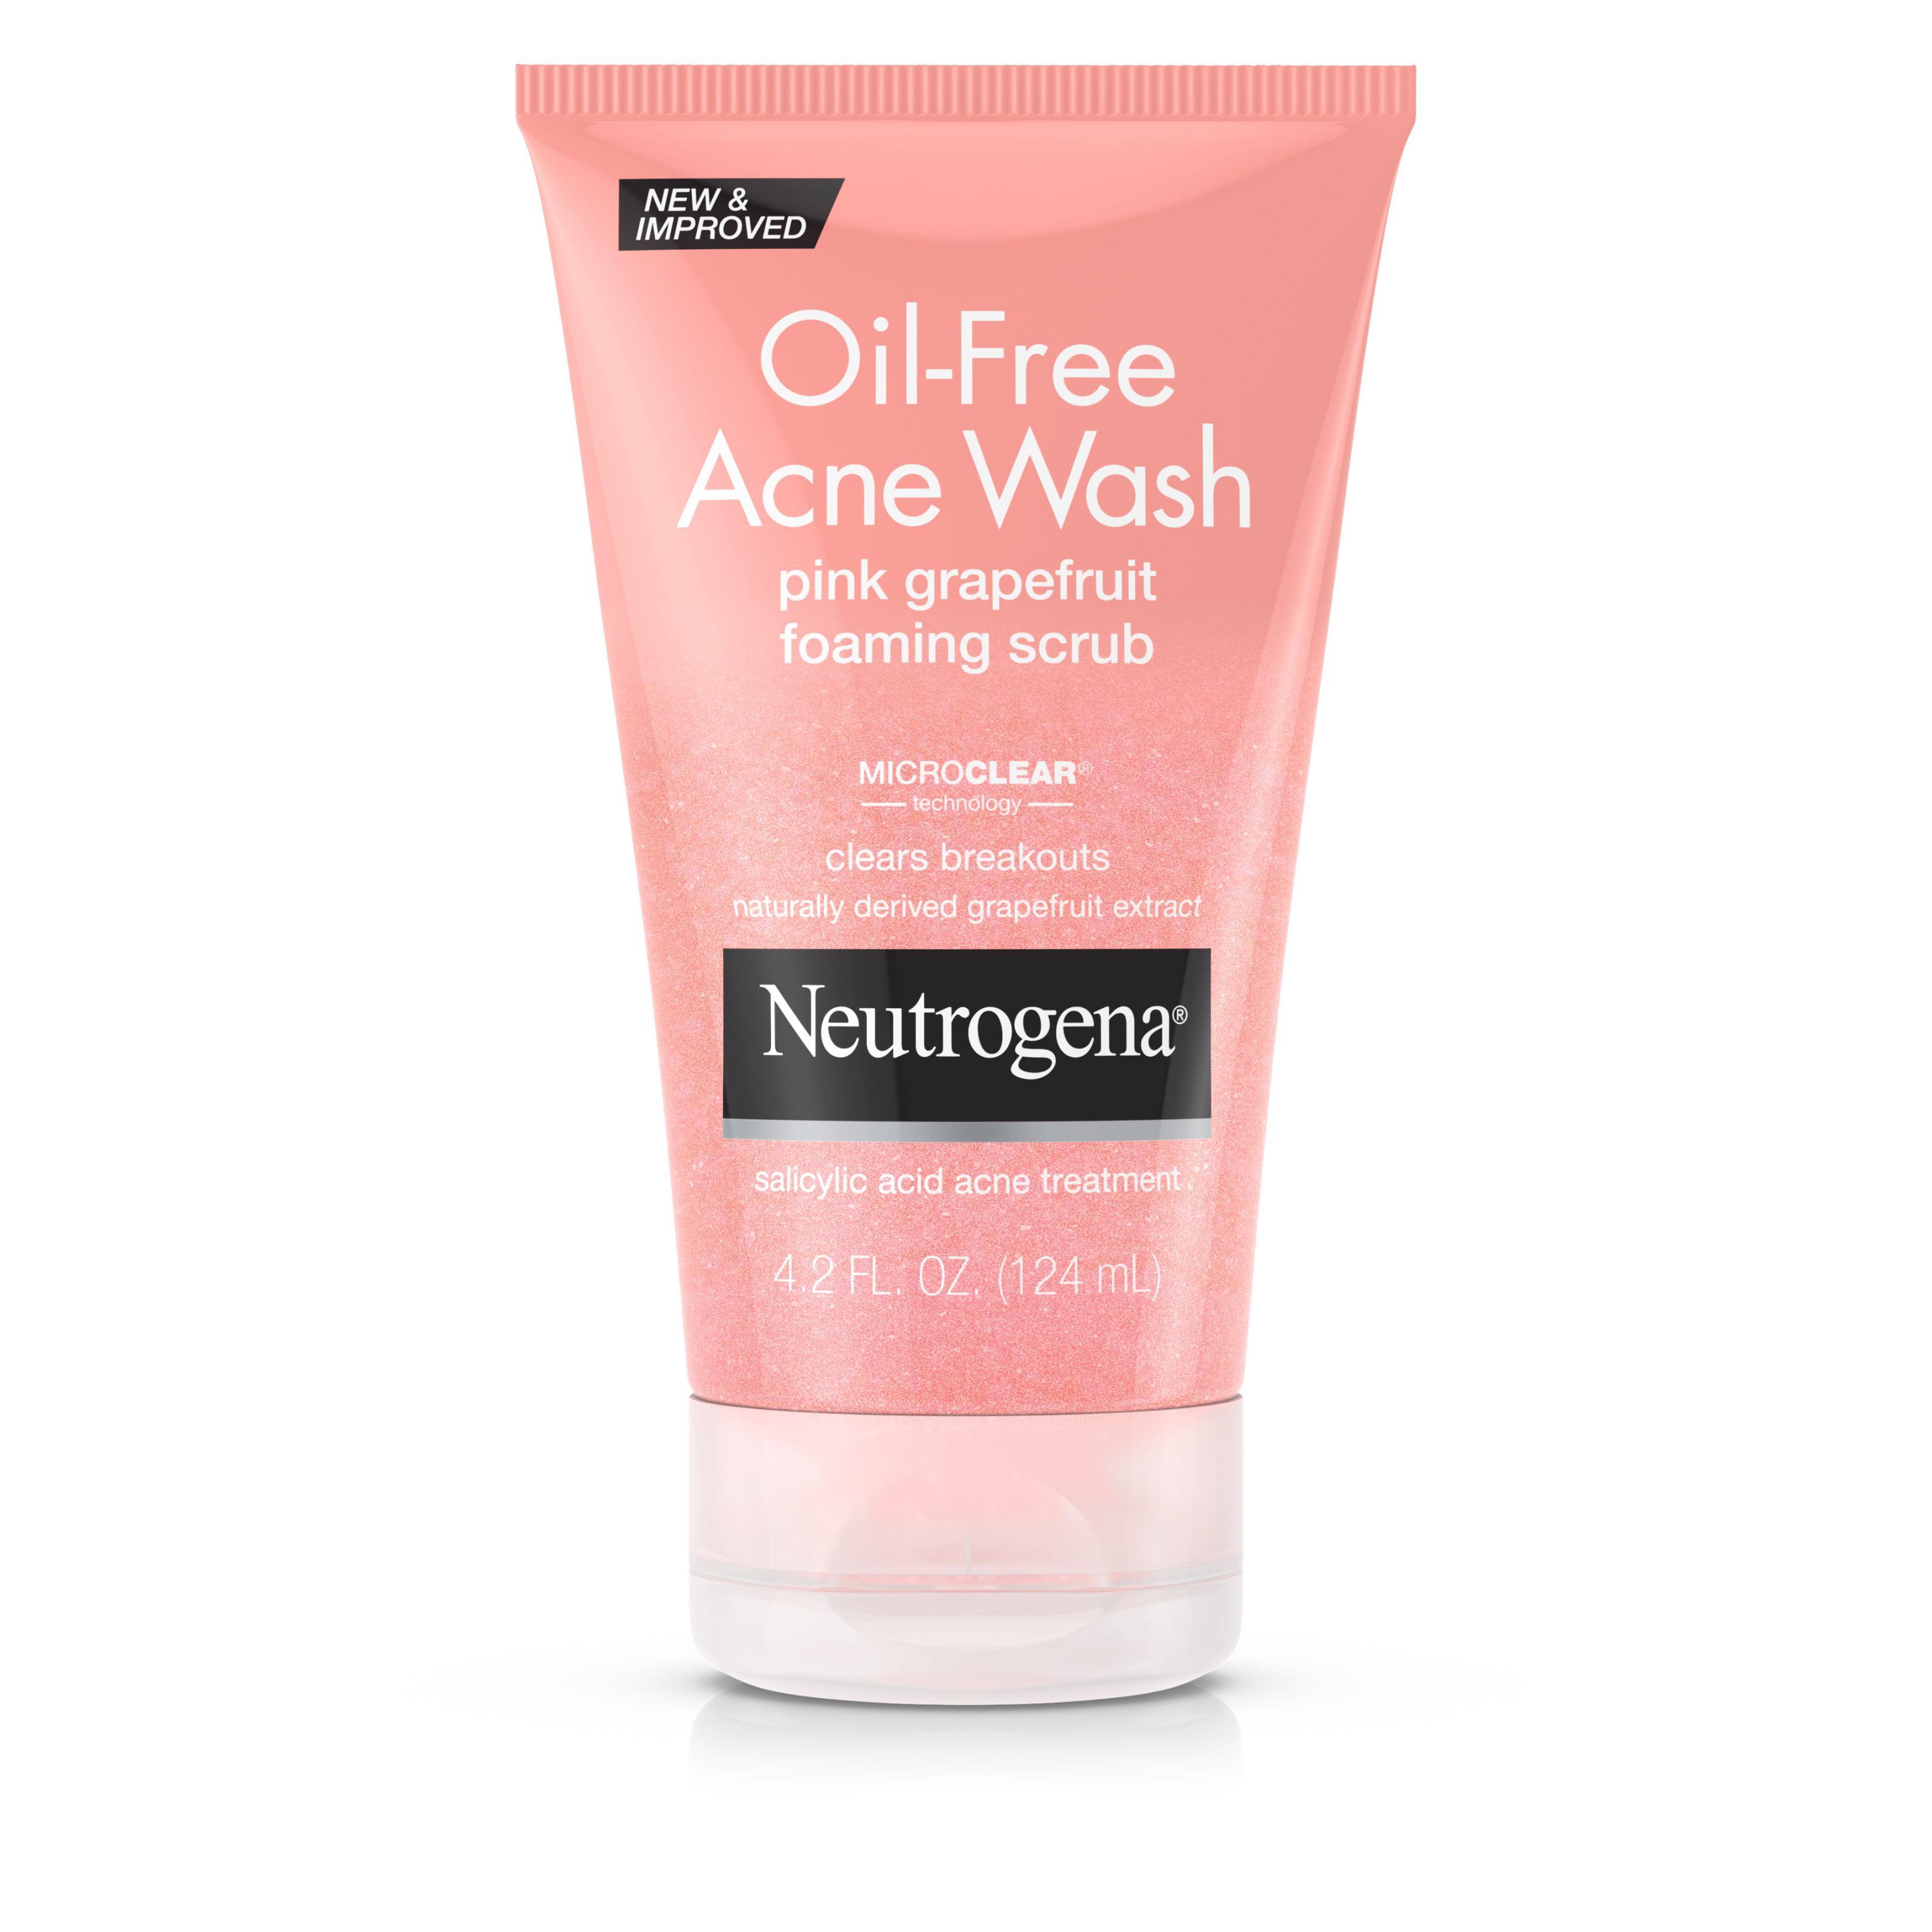 Neutrogena Oil-Free Acne Face Wash Pink Grapefruit Foaming Scrub, Salicylic Acid Acne Treatment, 4.2 Fl. Oz.